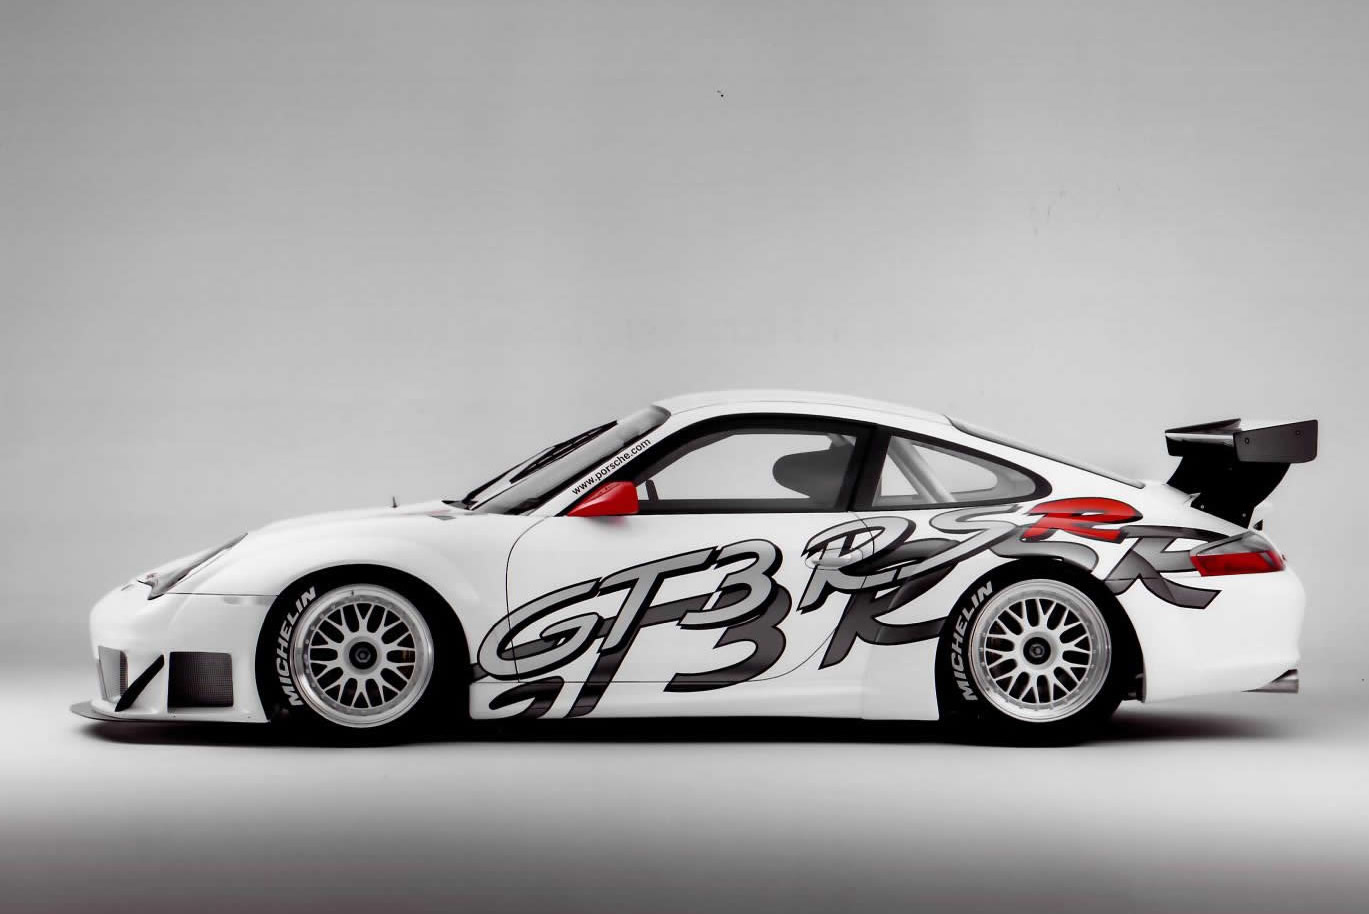 996 GT3RSR